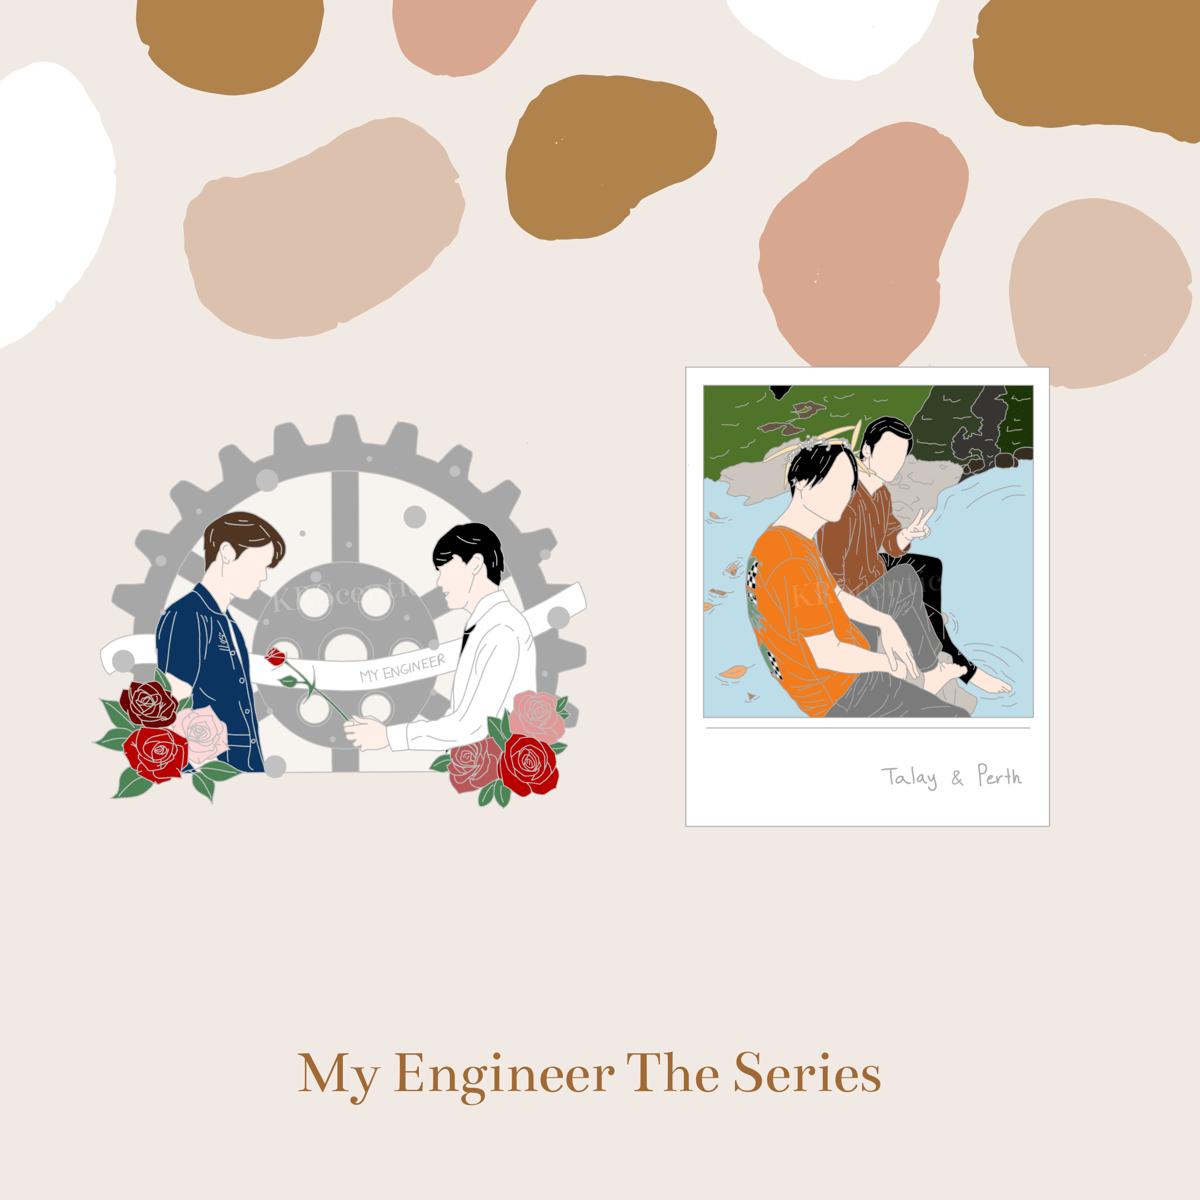 [PO] My Engineer The Series Rose/Talay & Perth Enamel Pin